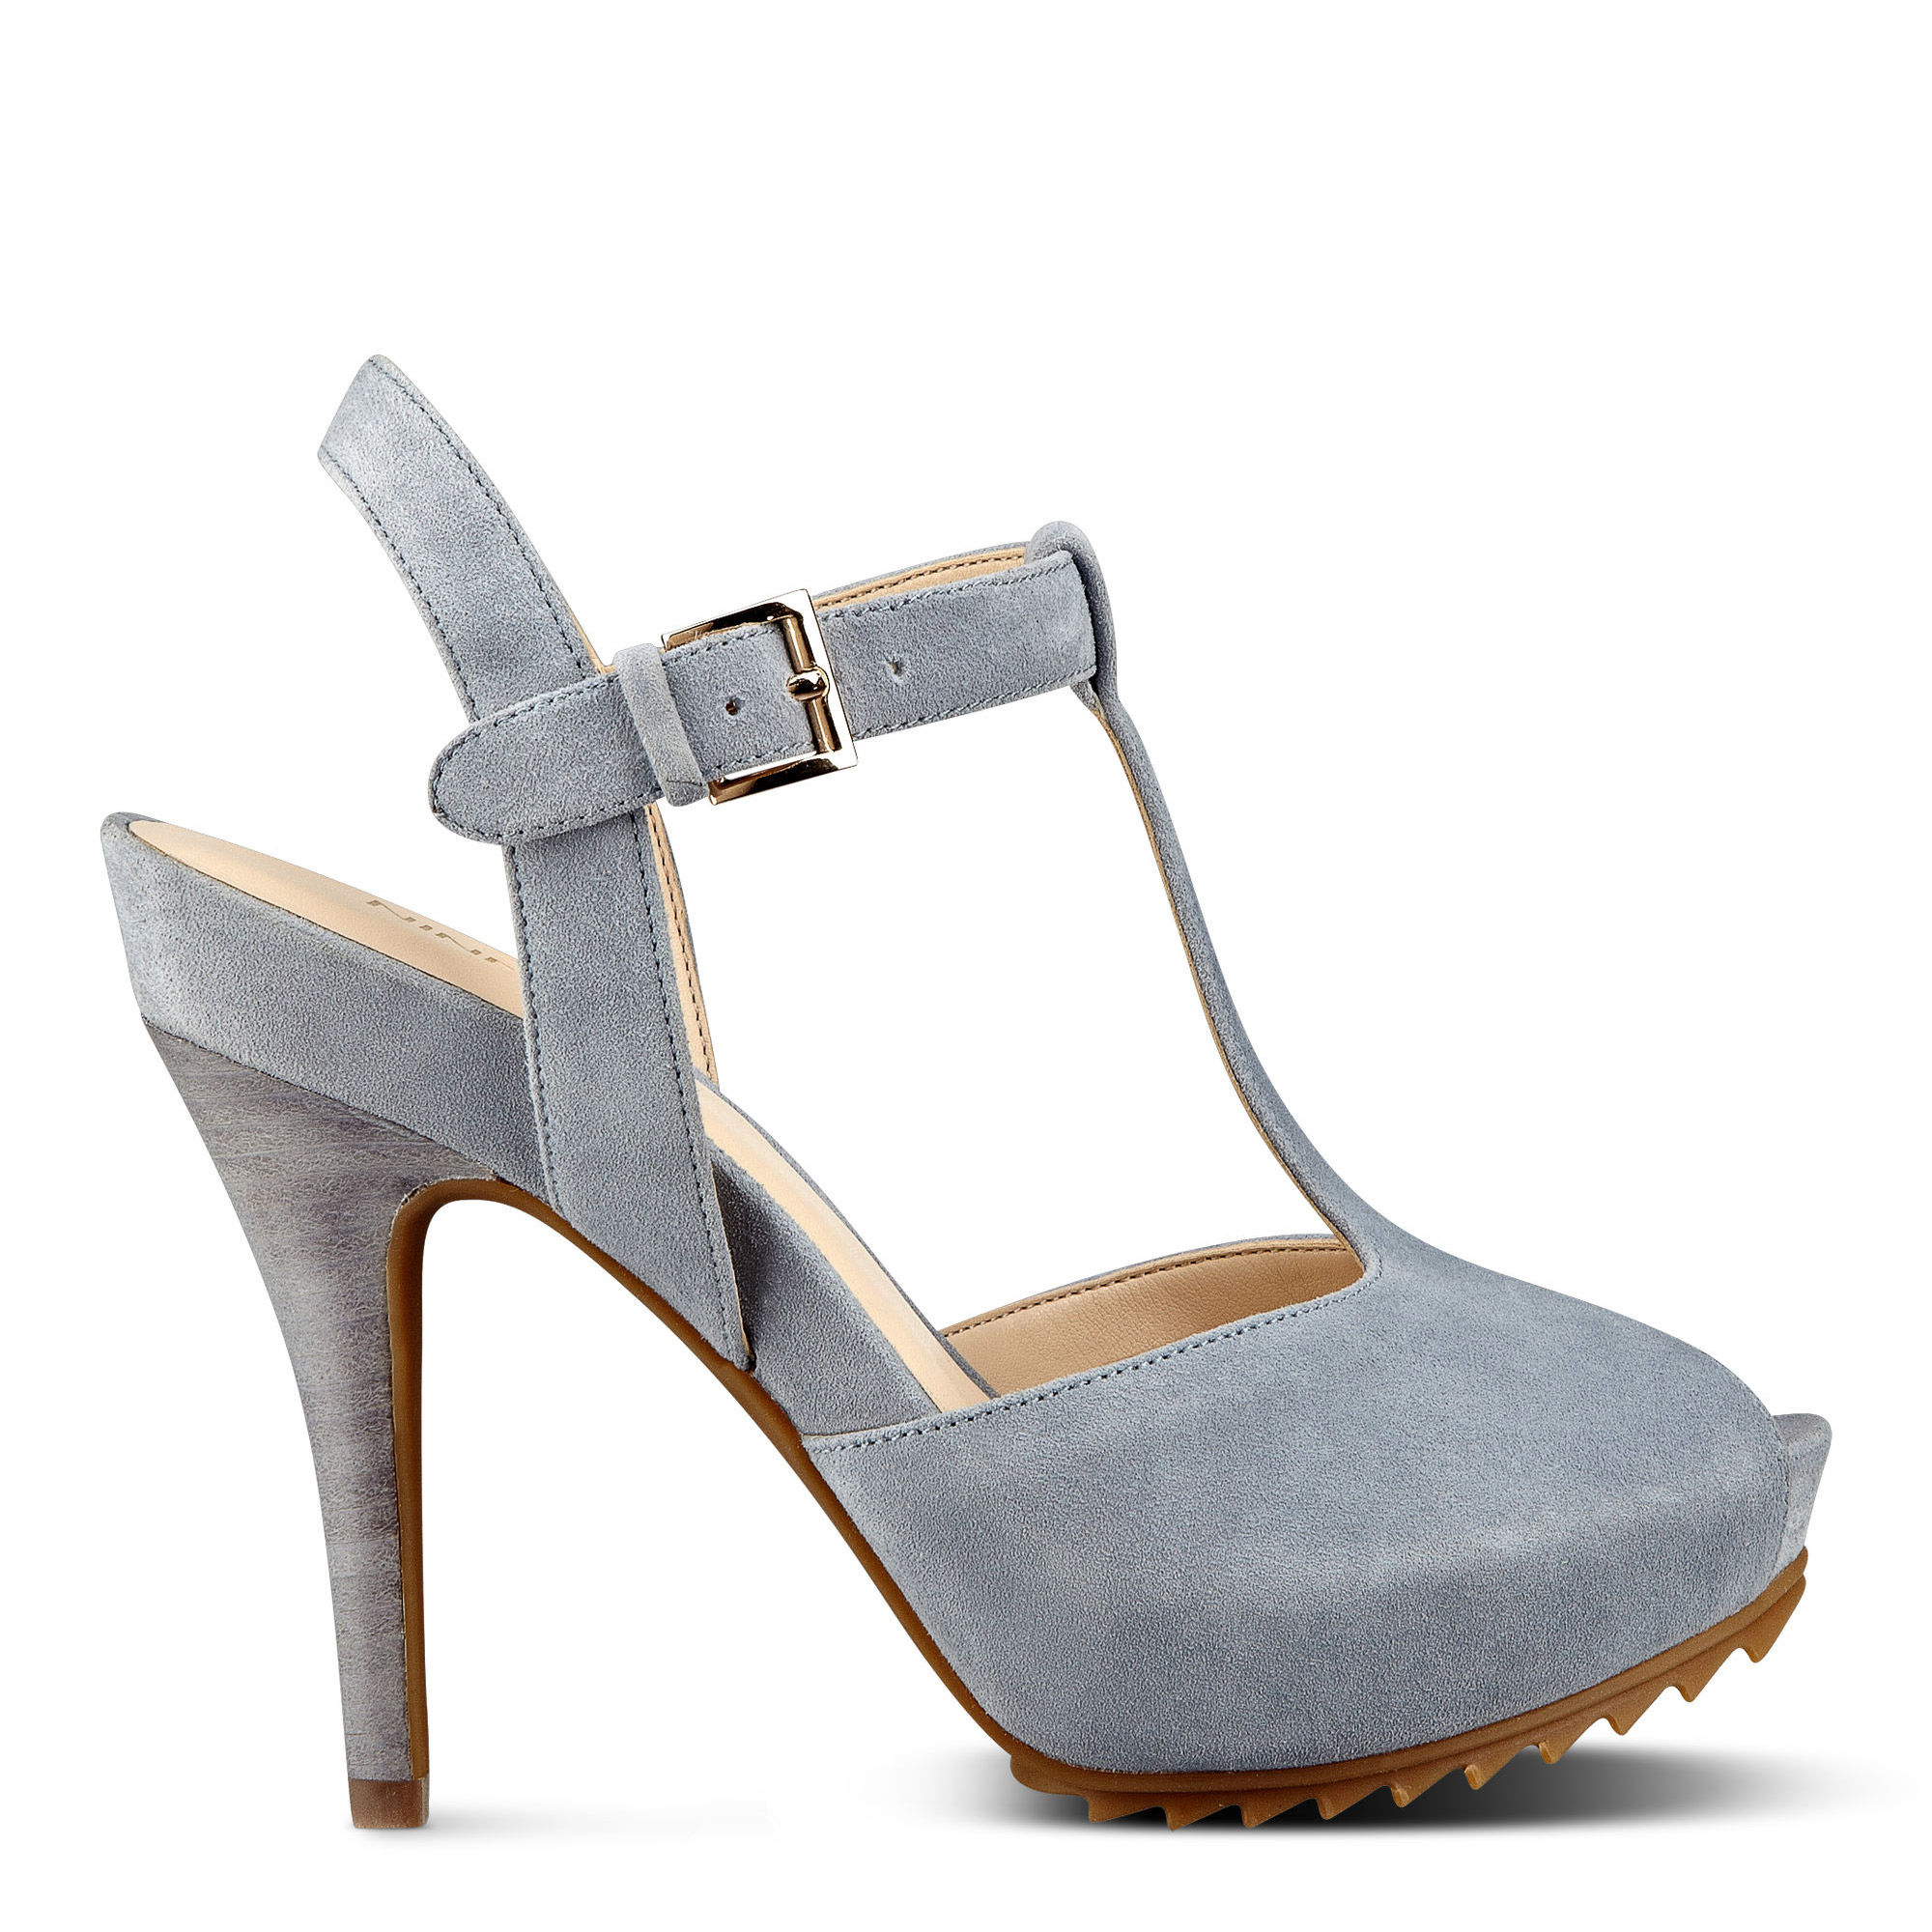 c4b52d42617ded Lyst - Nine West Radisa Platform Sandals in Gray